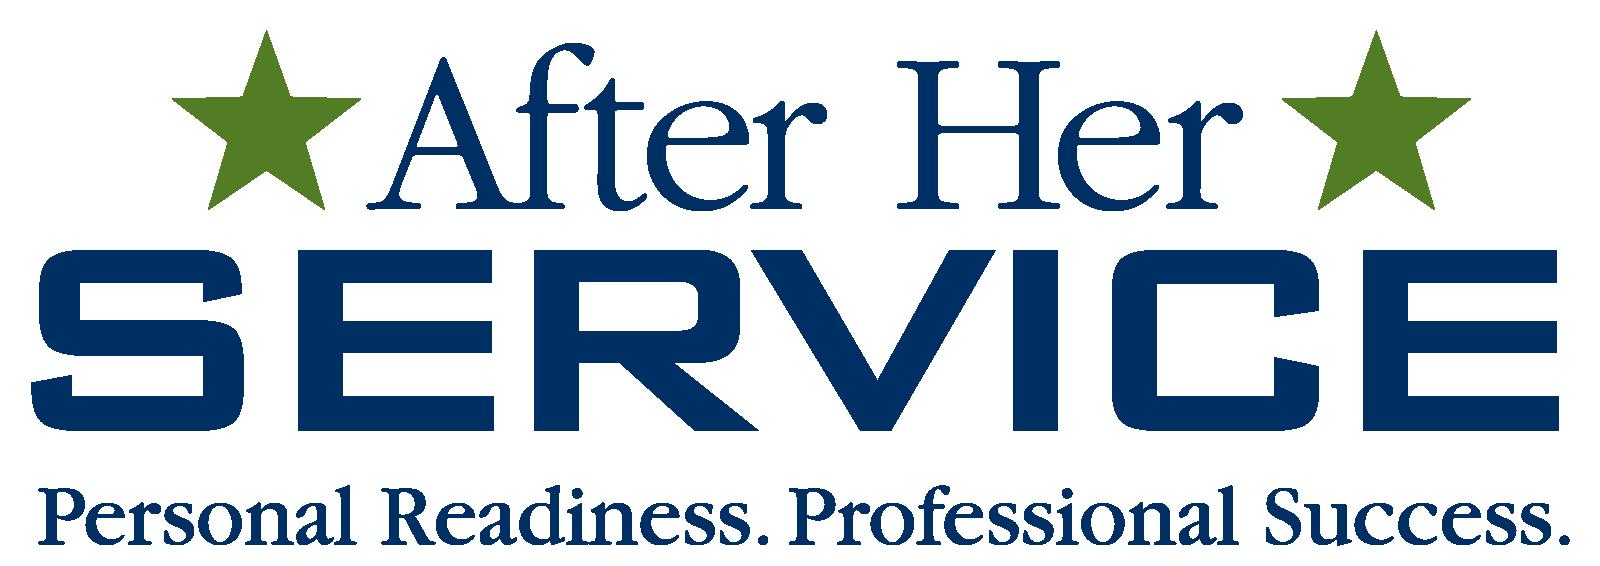 After Her Service logo